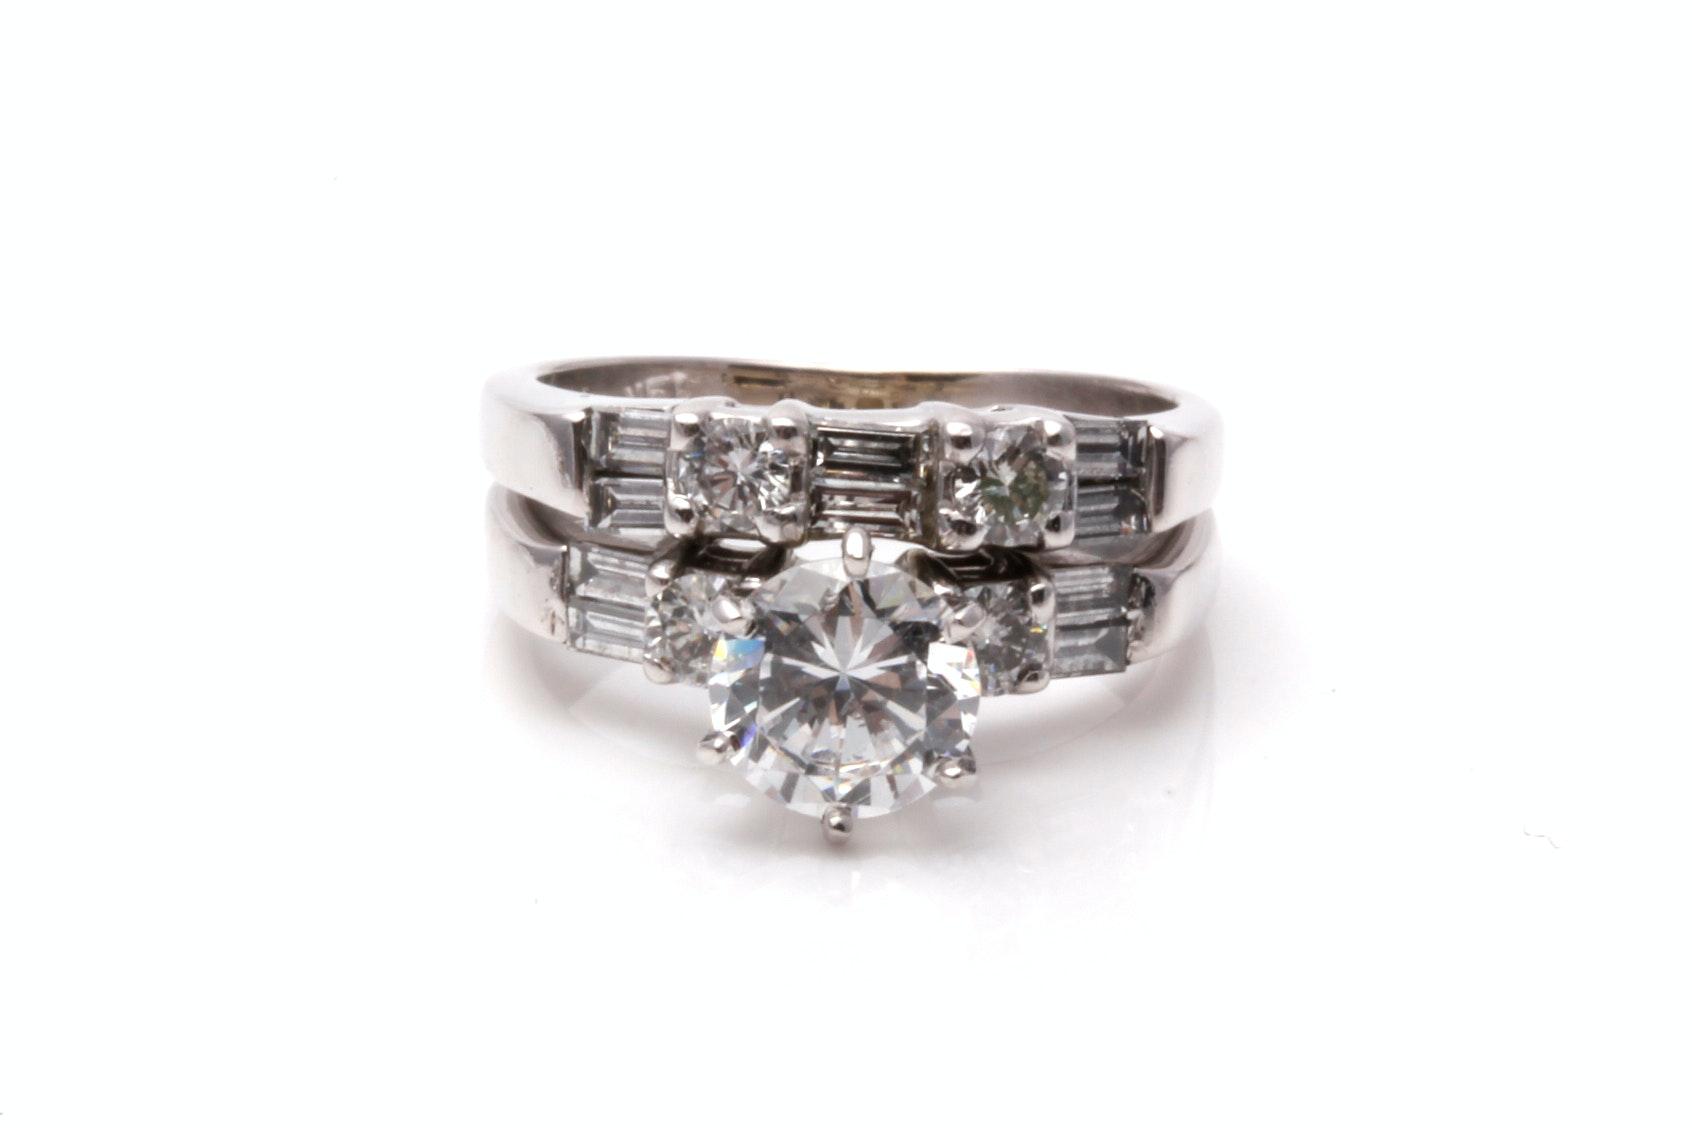 14K White Gold Diamond Semi Mount Ring With Cubic Zirconia Center Stone